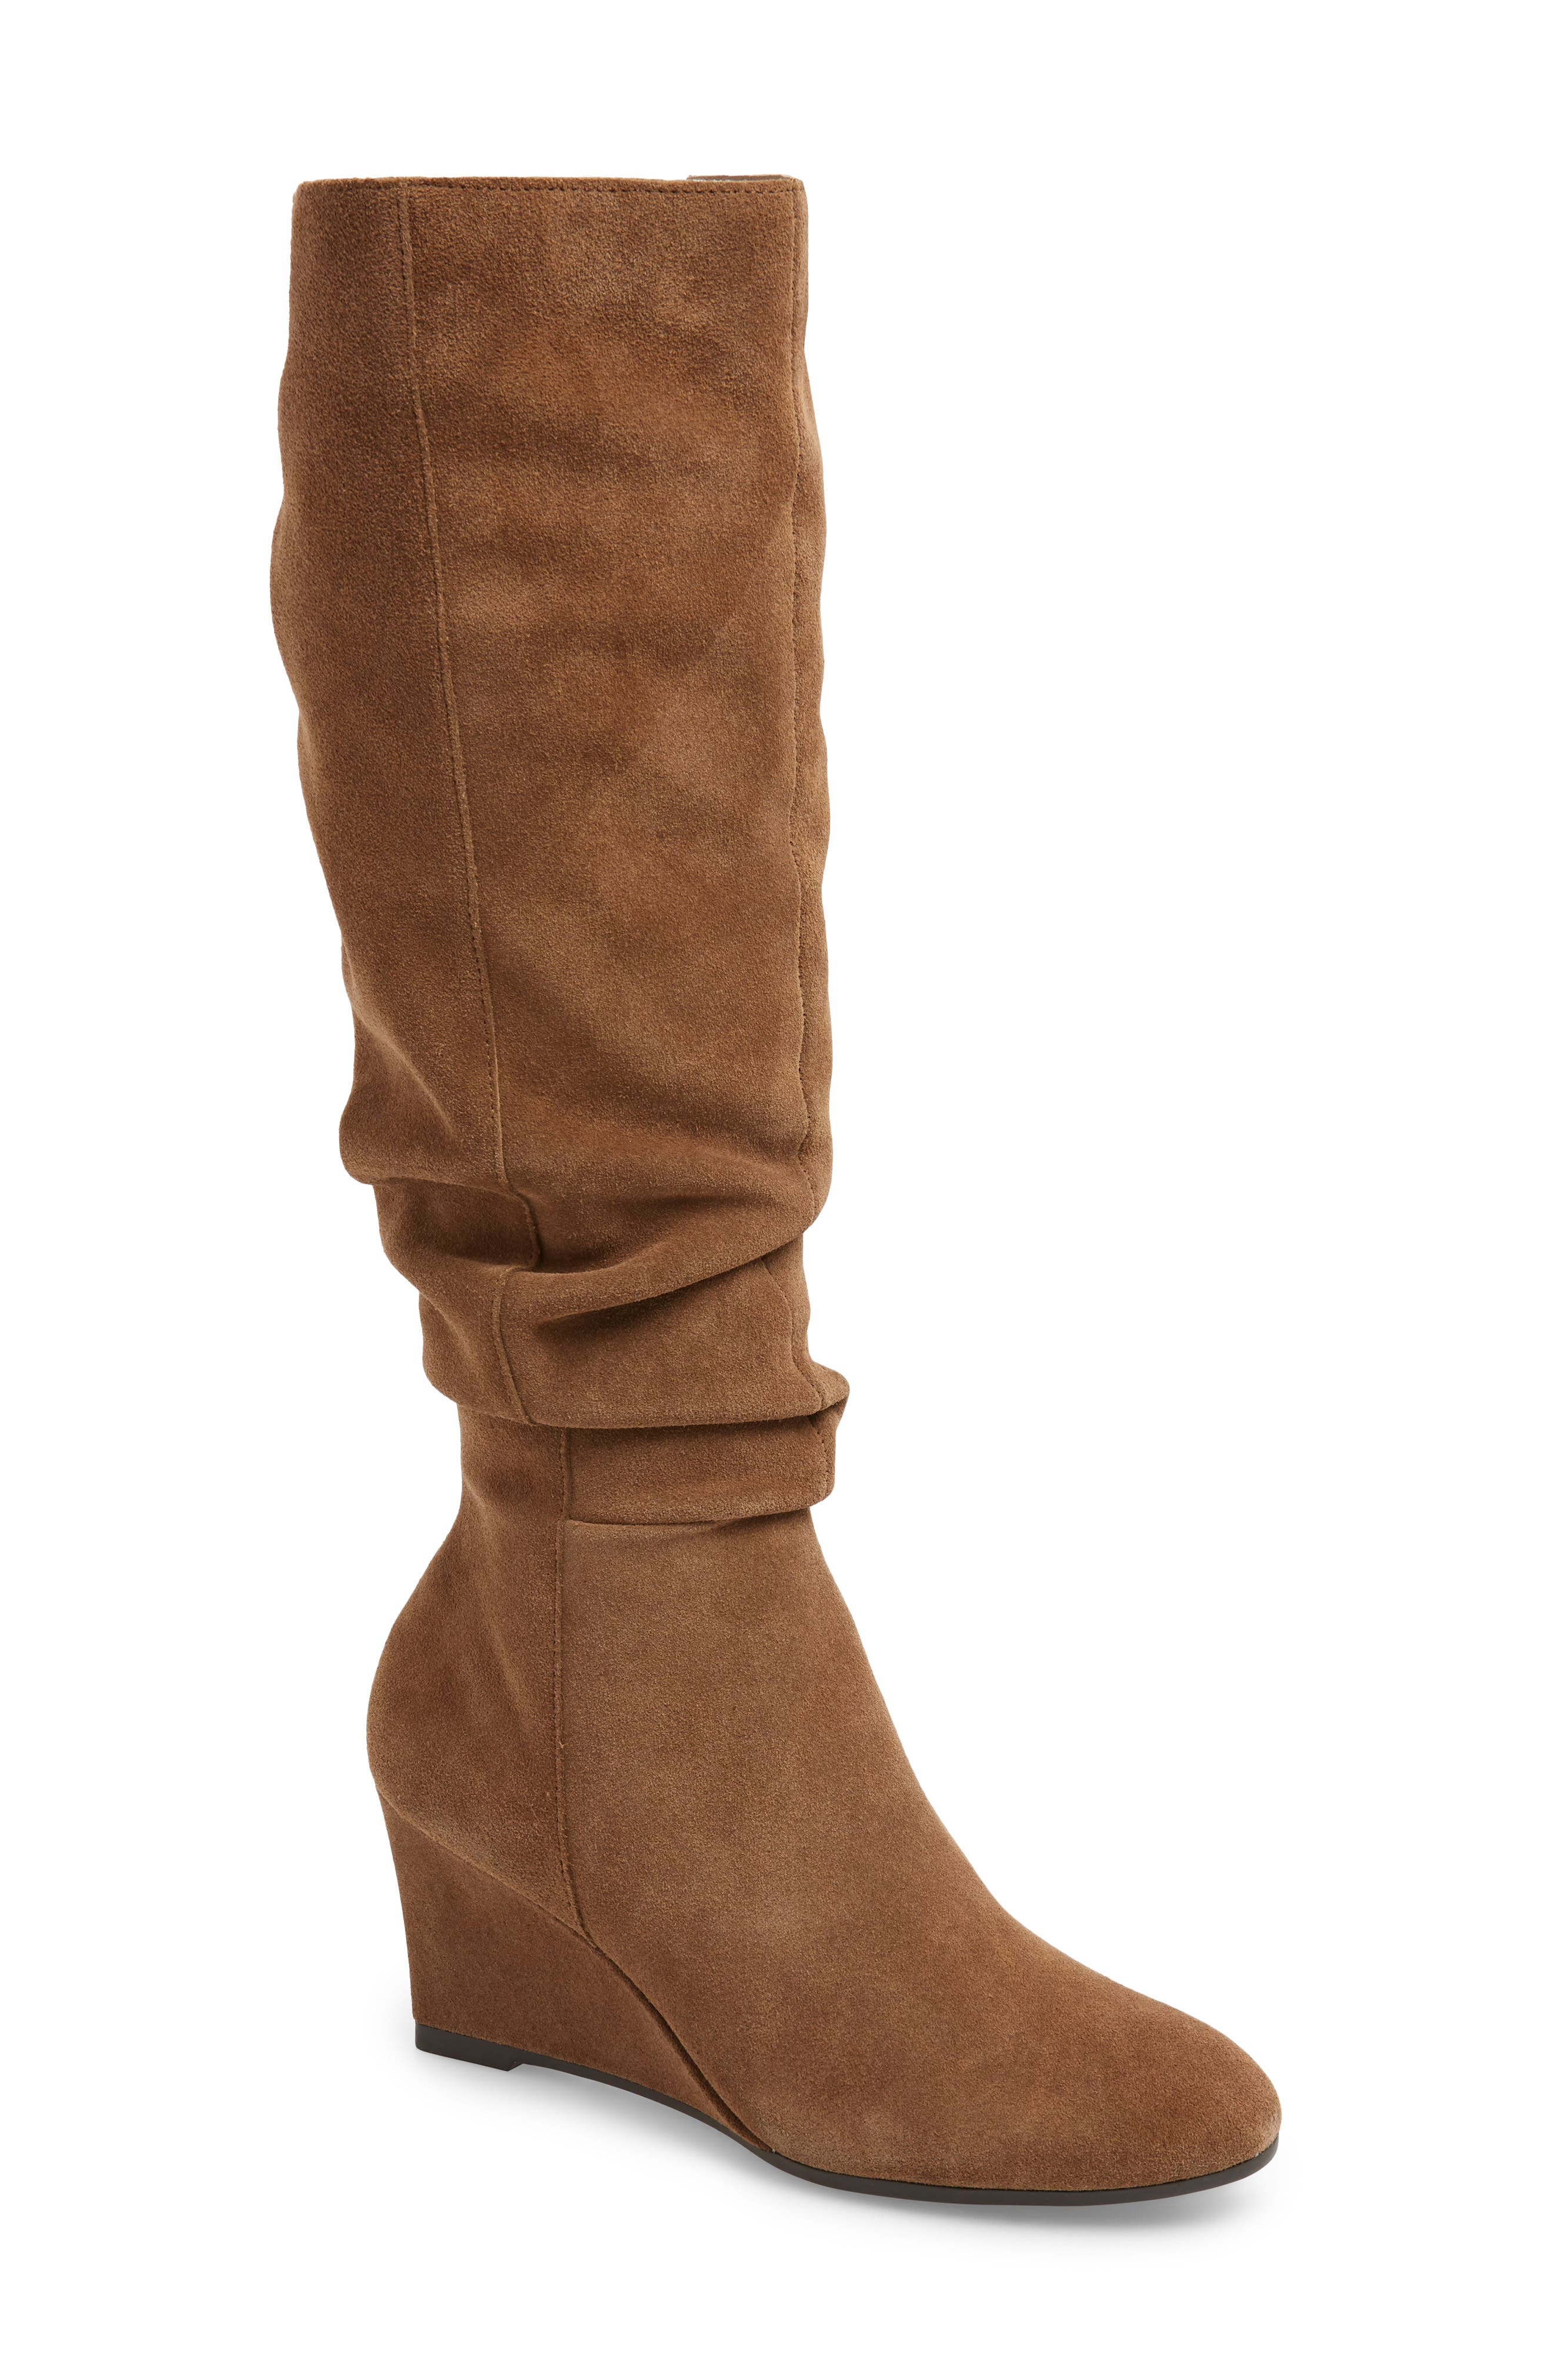 Bettye Muller Concepts Carole Knee High Boot- Beige